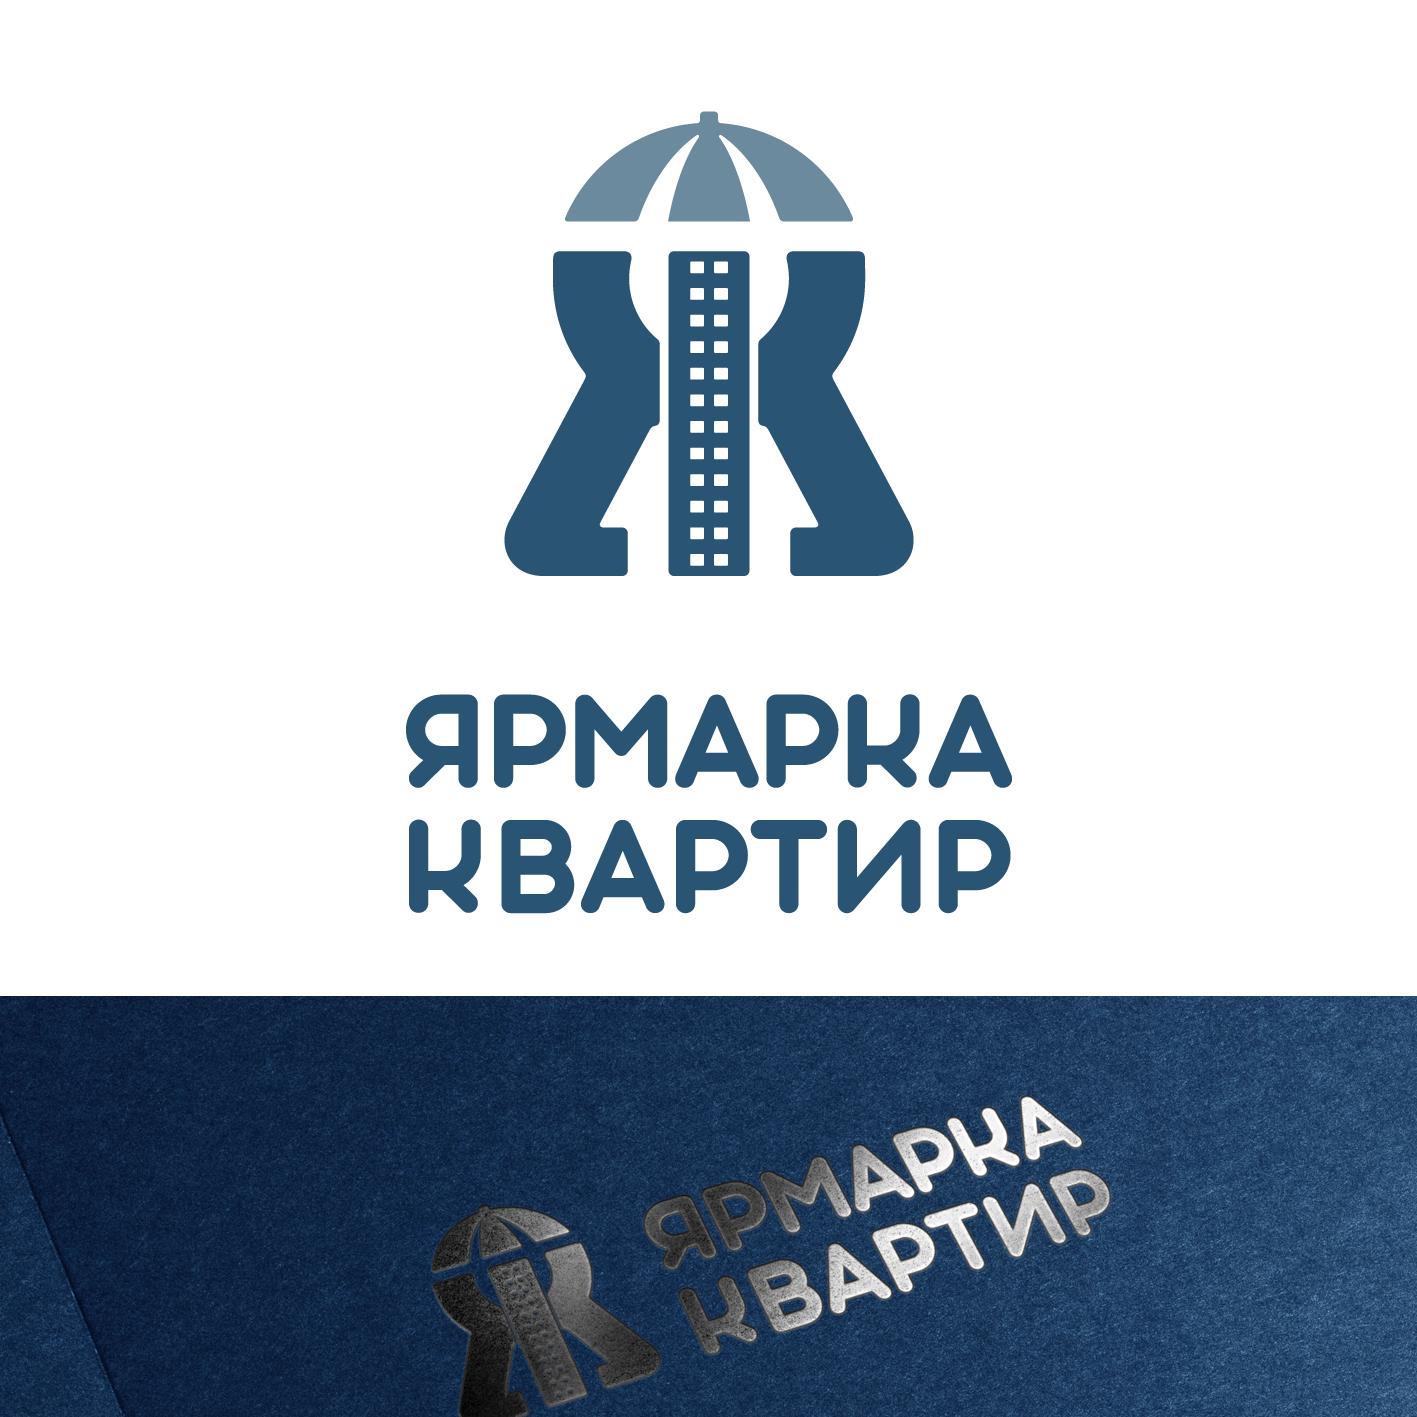 Создание логотипа, с вариантами для визитки и листовки фото f_230600696a41fb27.png